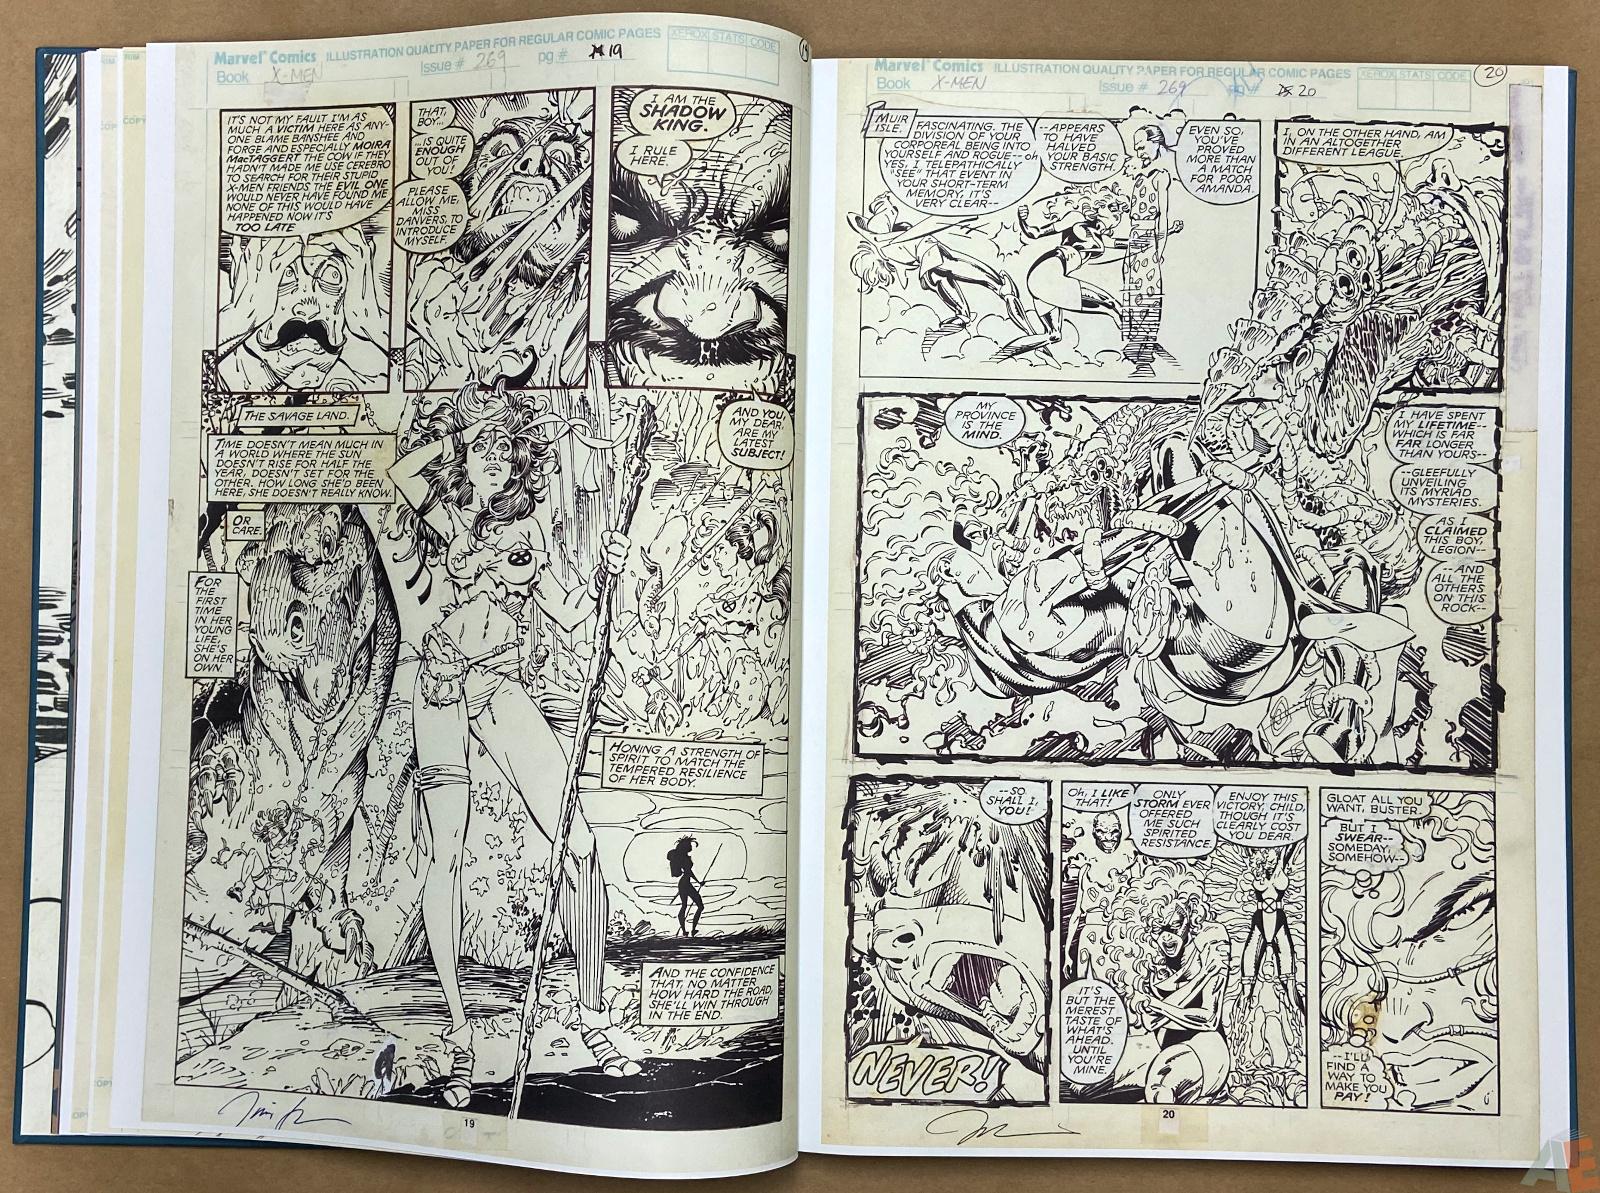 Jim Lees X Men Artists Edition interior 7